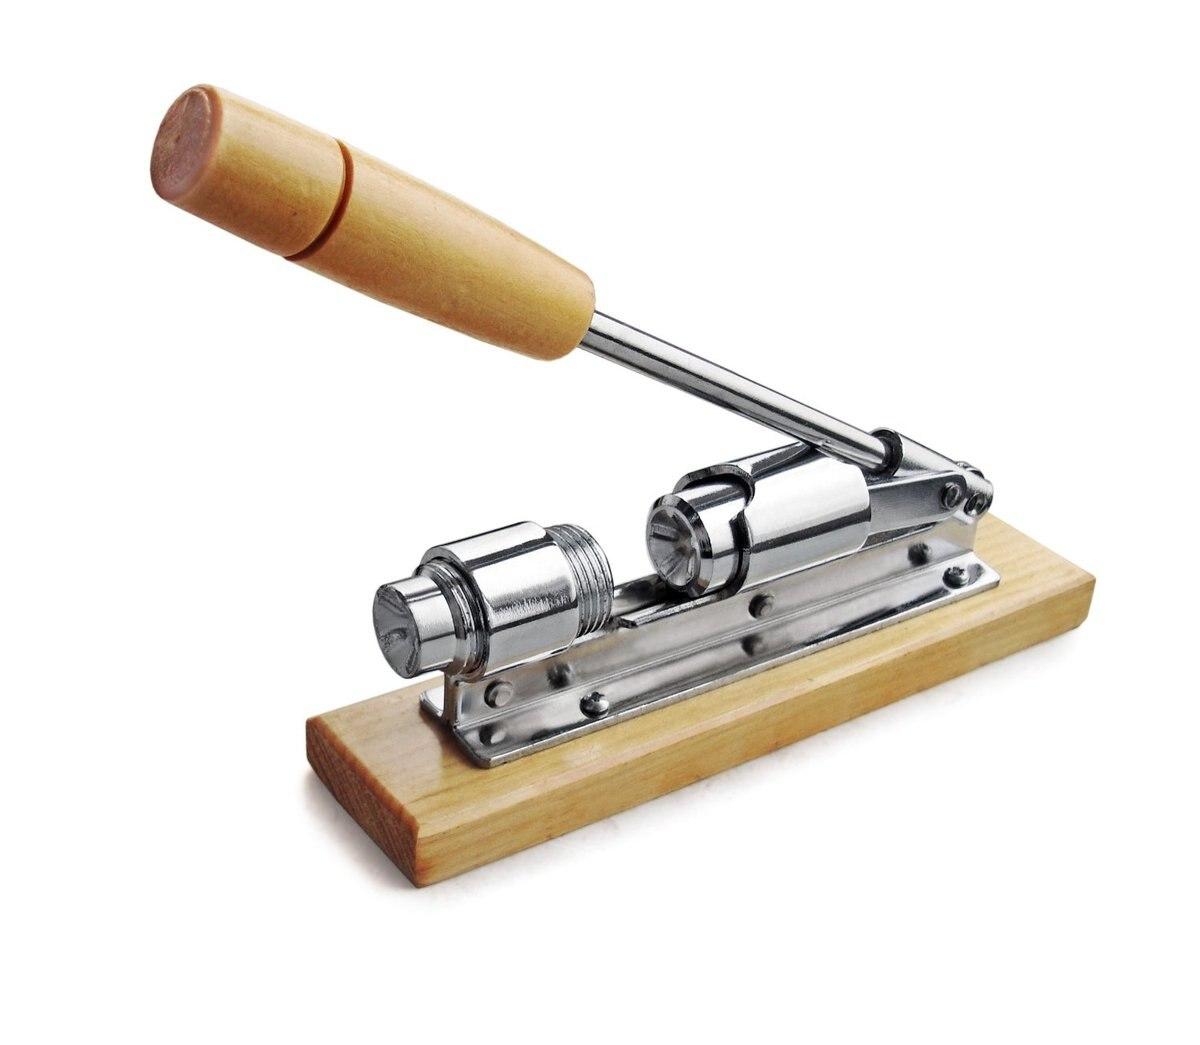 ¡Ahorra energía! Accesorios de cocina Gadgets Manual Cascanueces fácil abridor herramientas cocina prensa Chopper